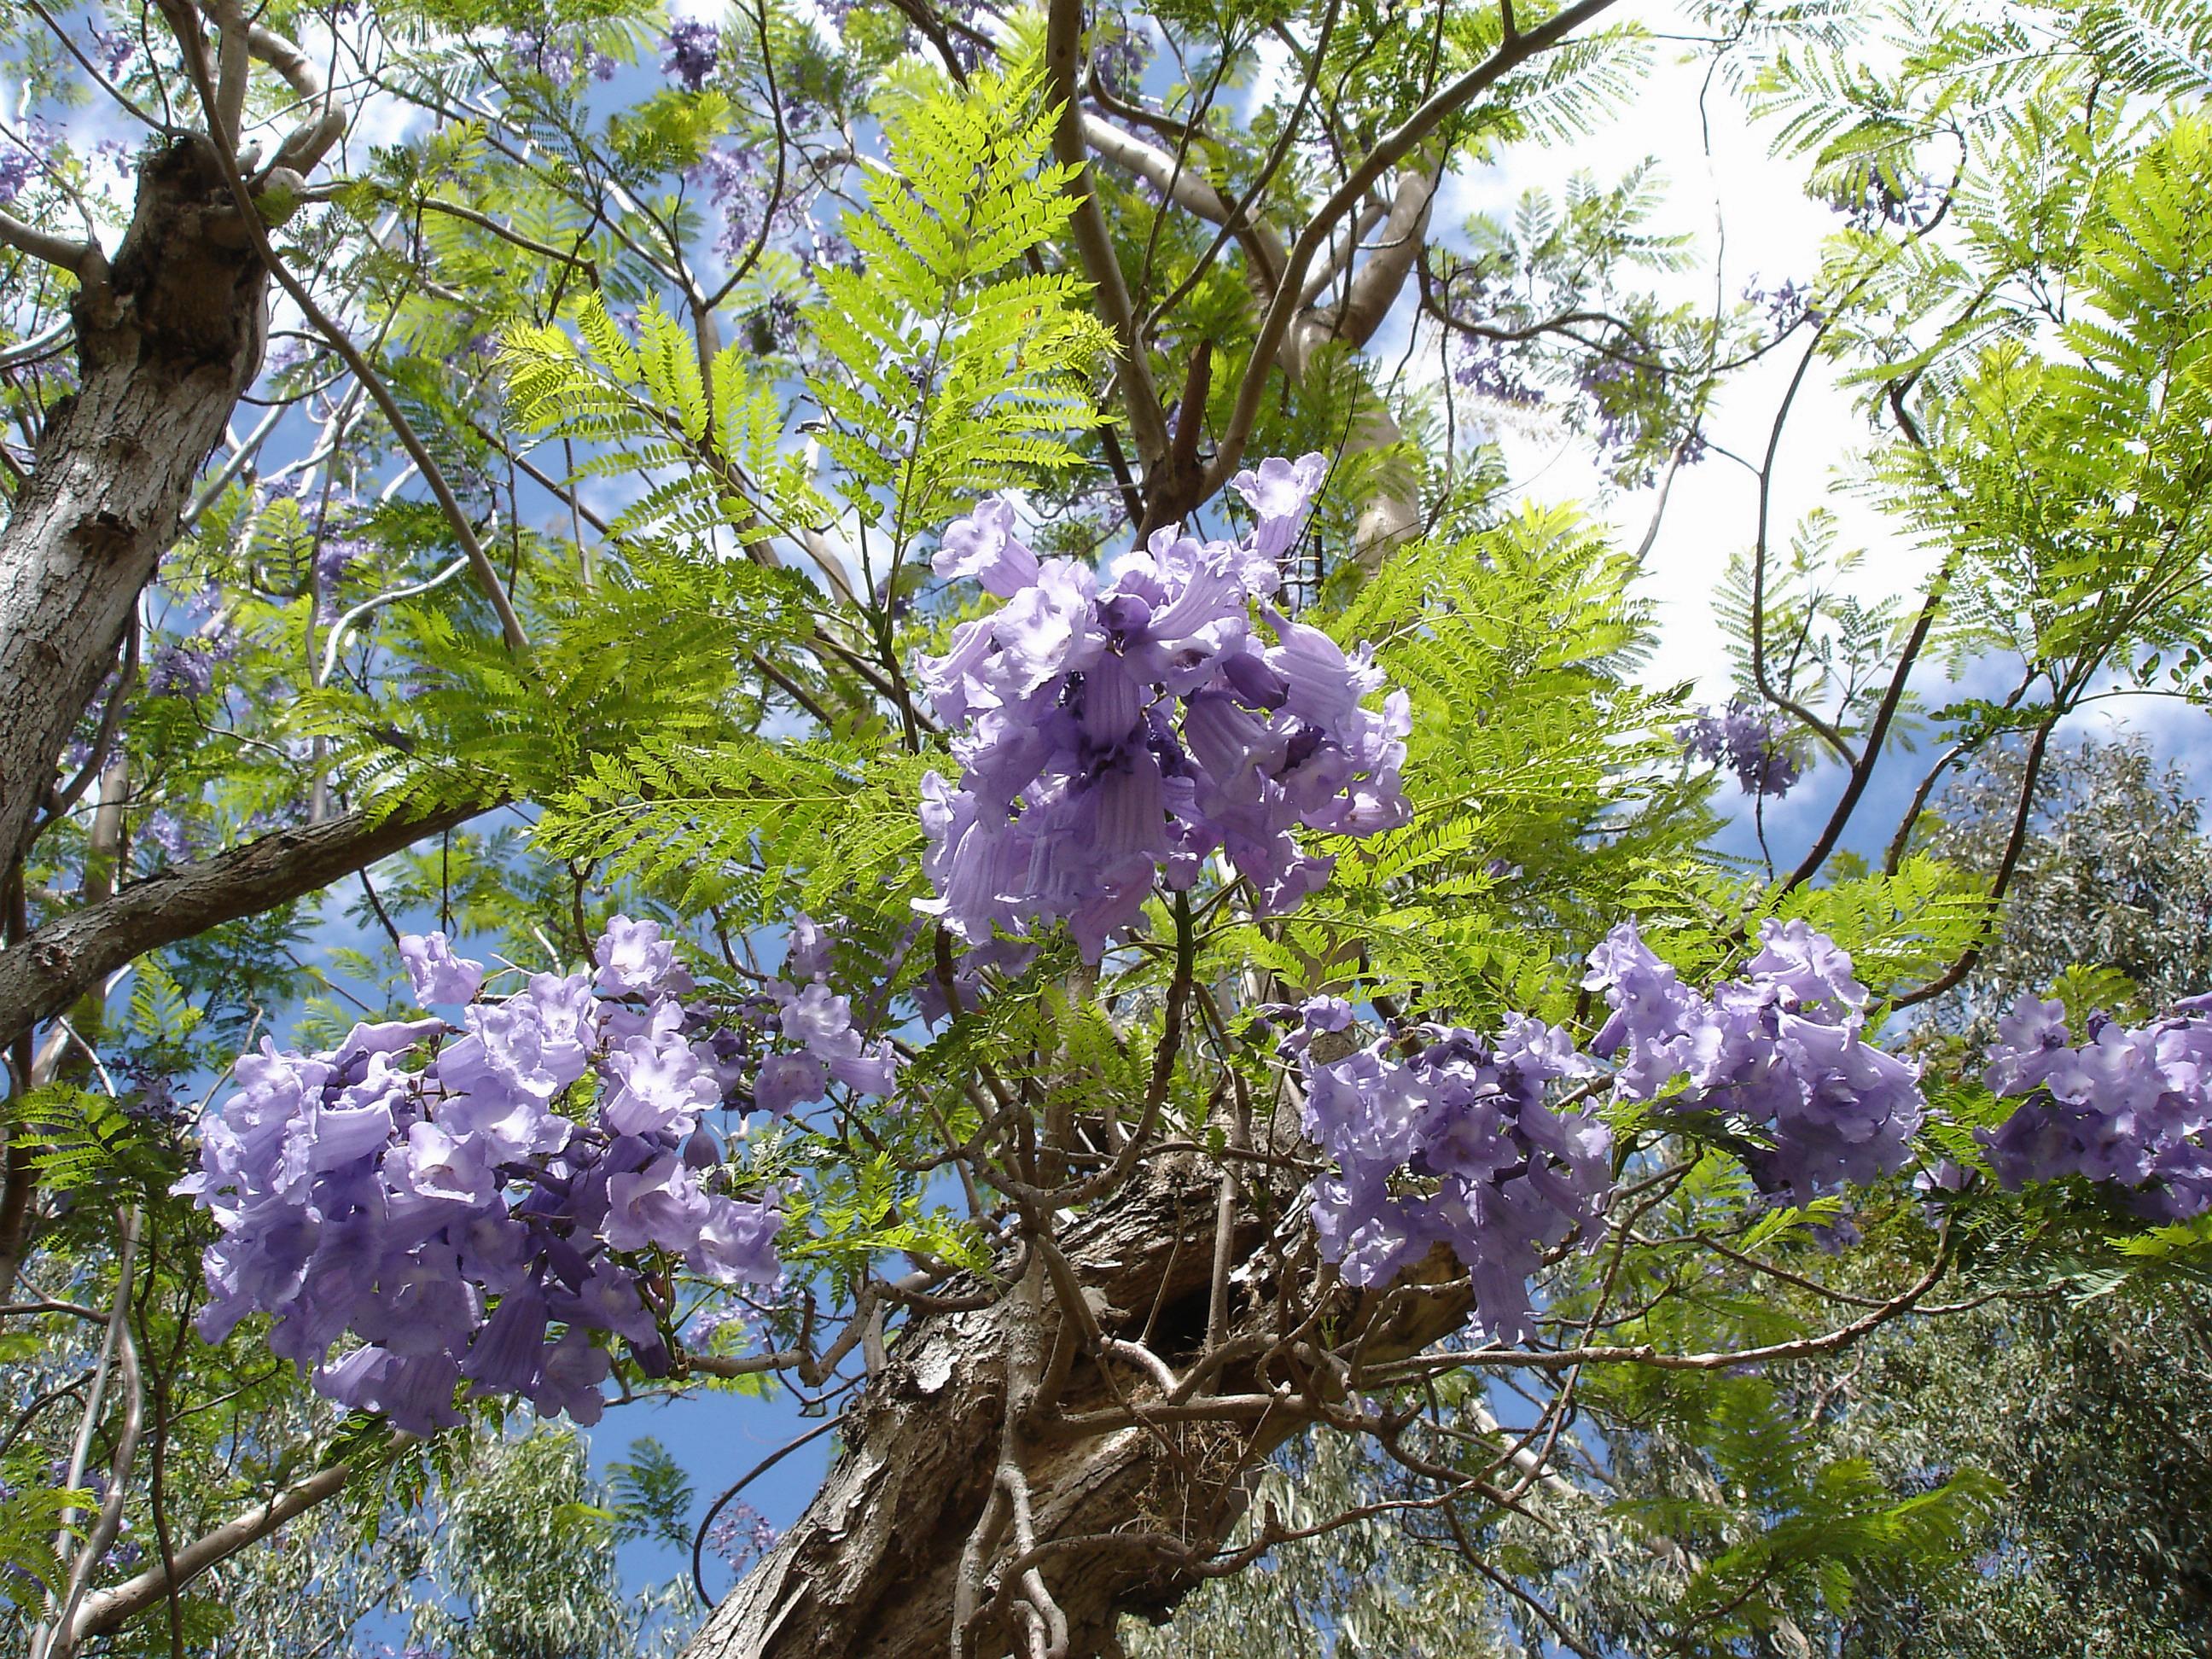 Palisanderholzbaum  File:Jacaranda-mimosifolia-Mascarin.jpg - Wikimedia Commons